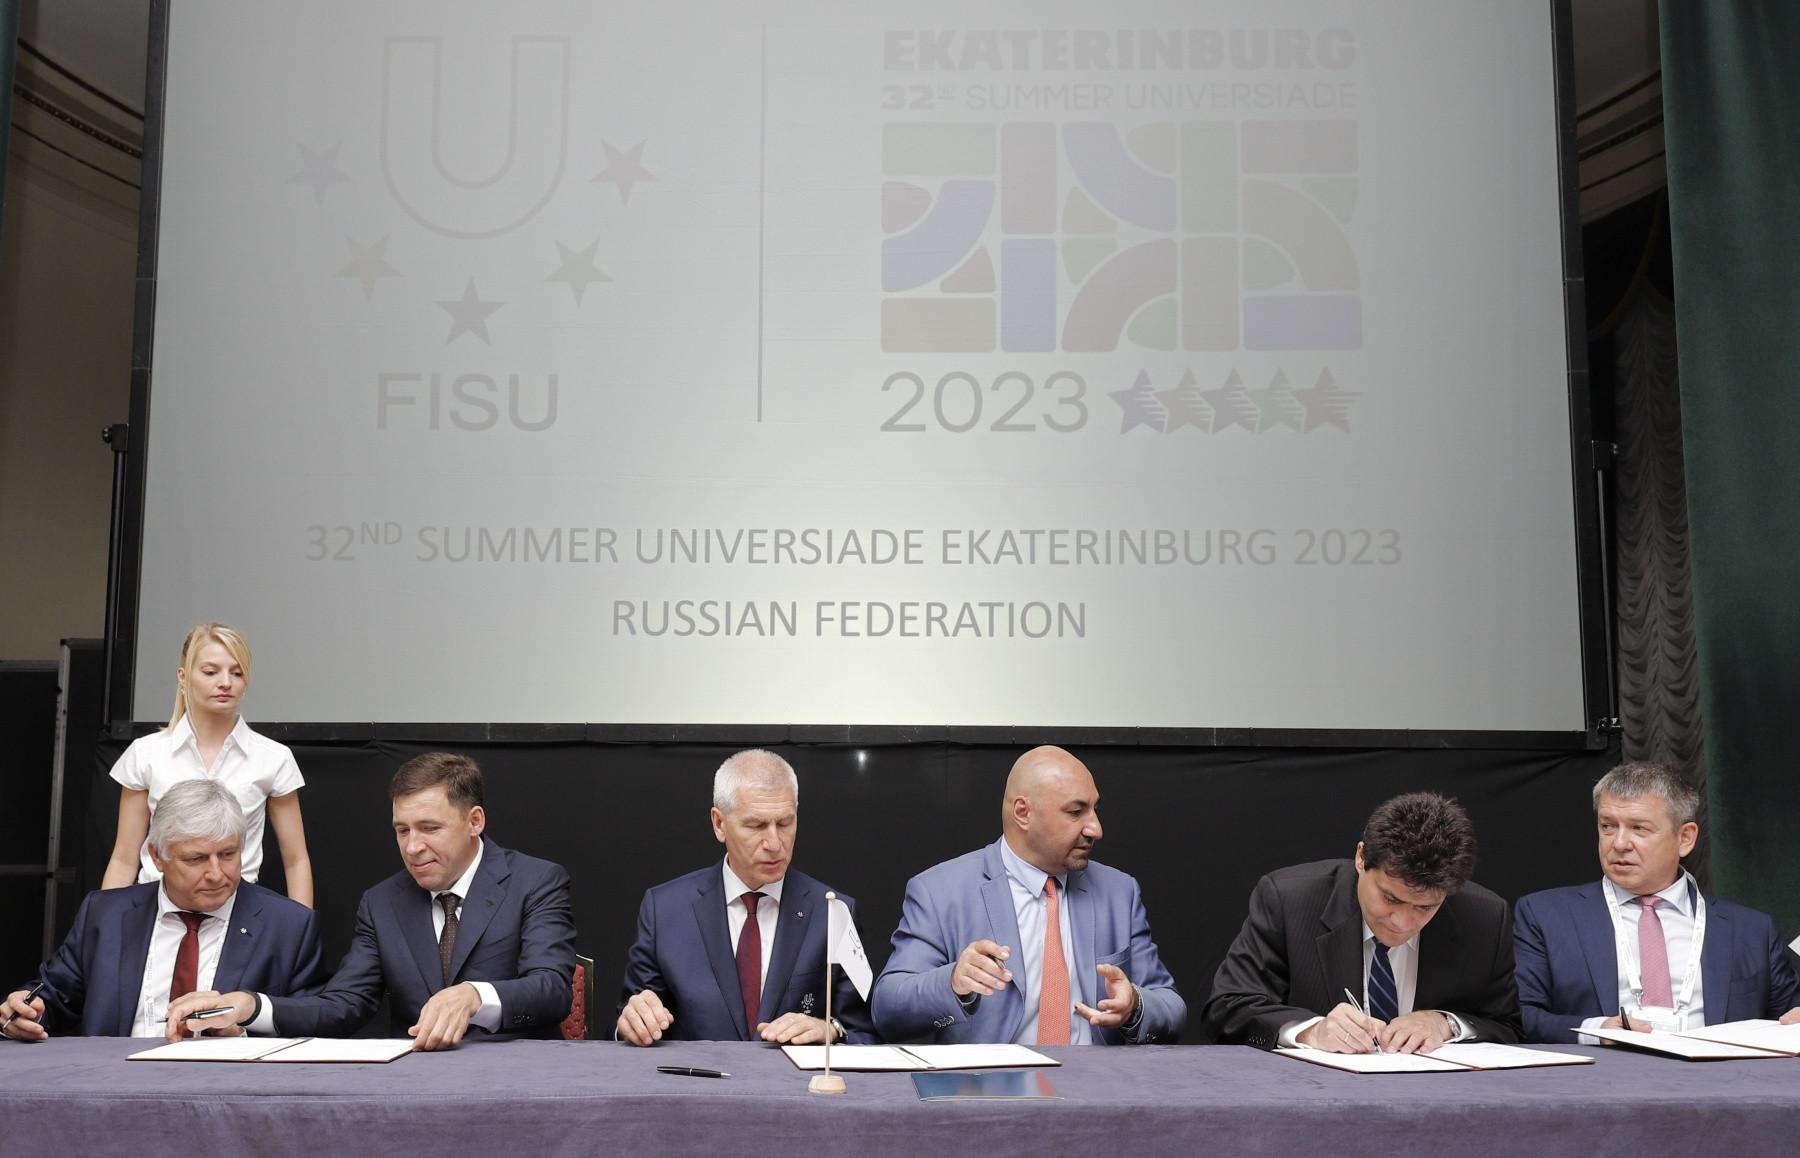 FISU have awarded the 2023 Summer Universiade to Yekaterinburg ©FISU